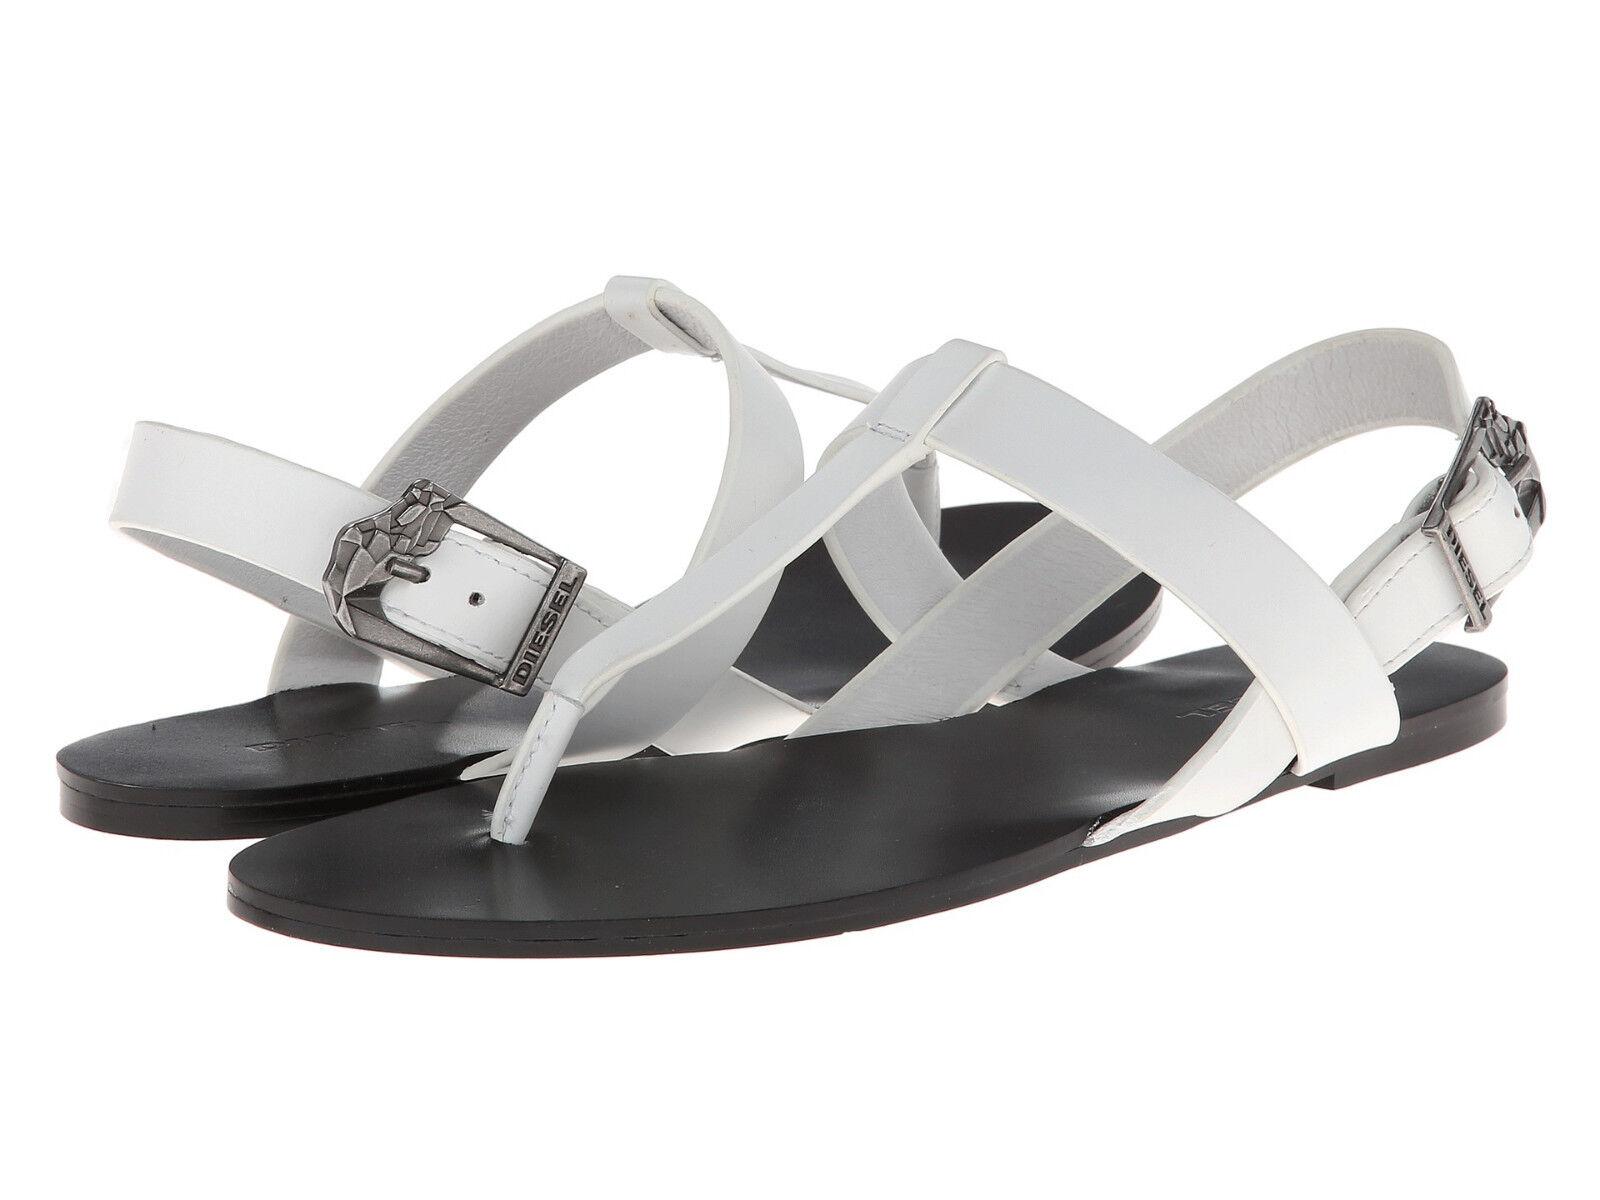 PVP    102 Nuevo Zapatos de Mujer Diesel walayla Himalie W blancoo Sandalias  exclusivo